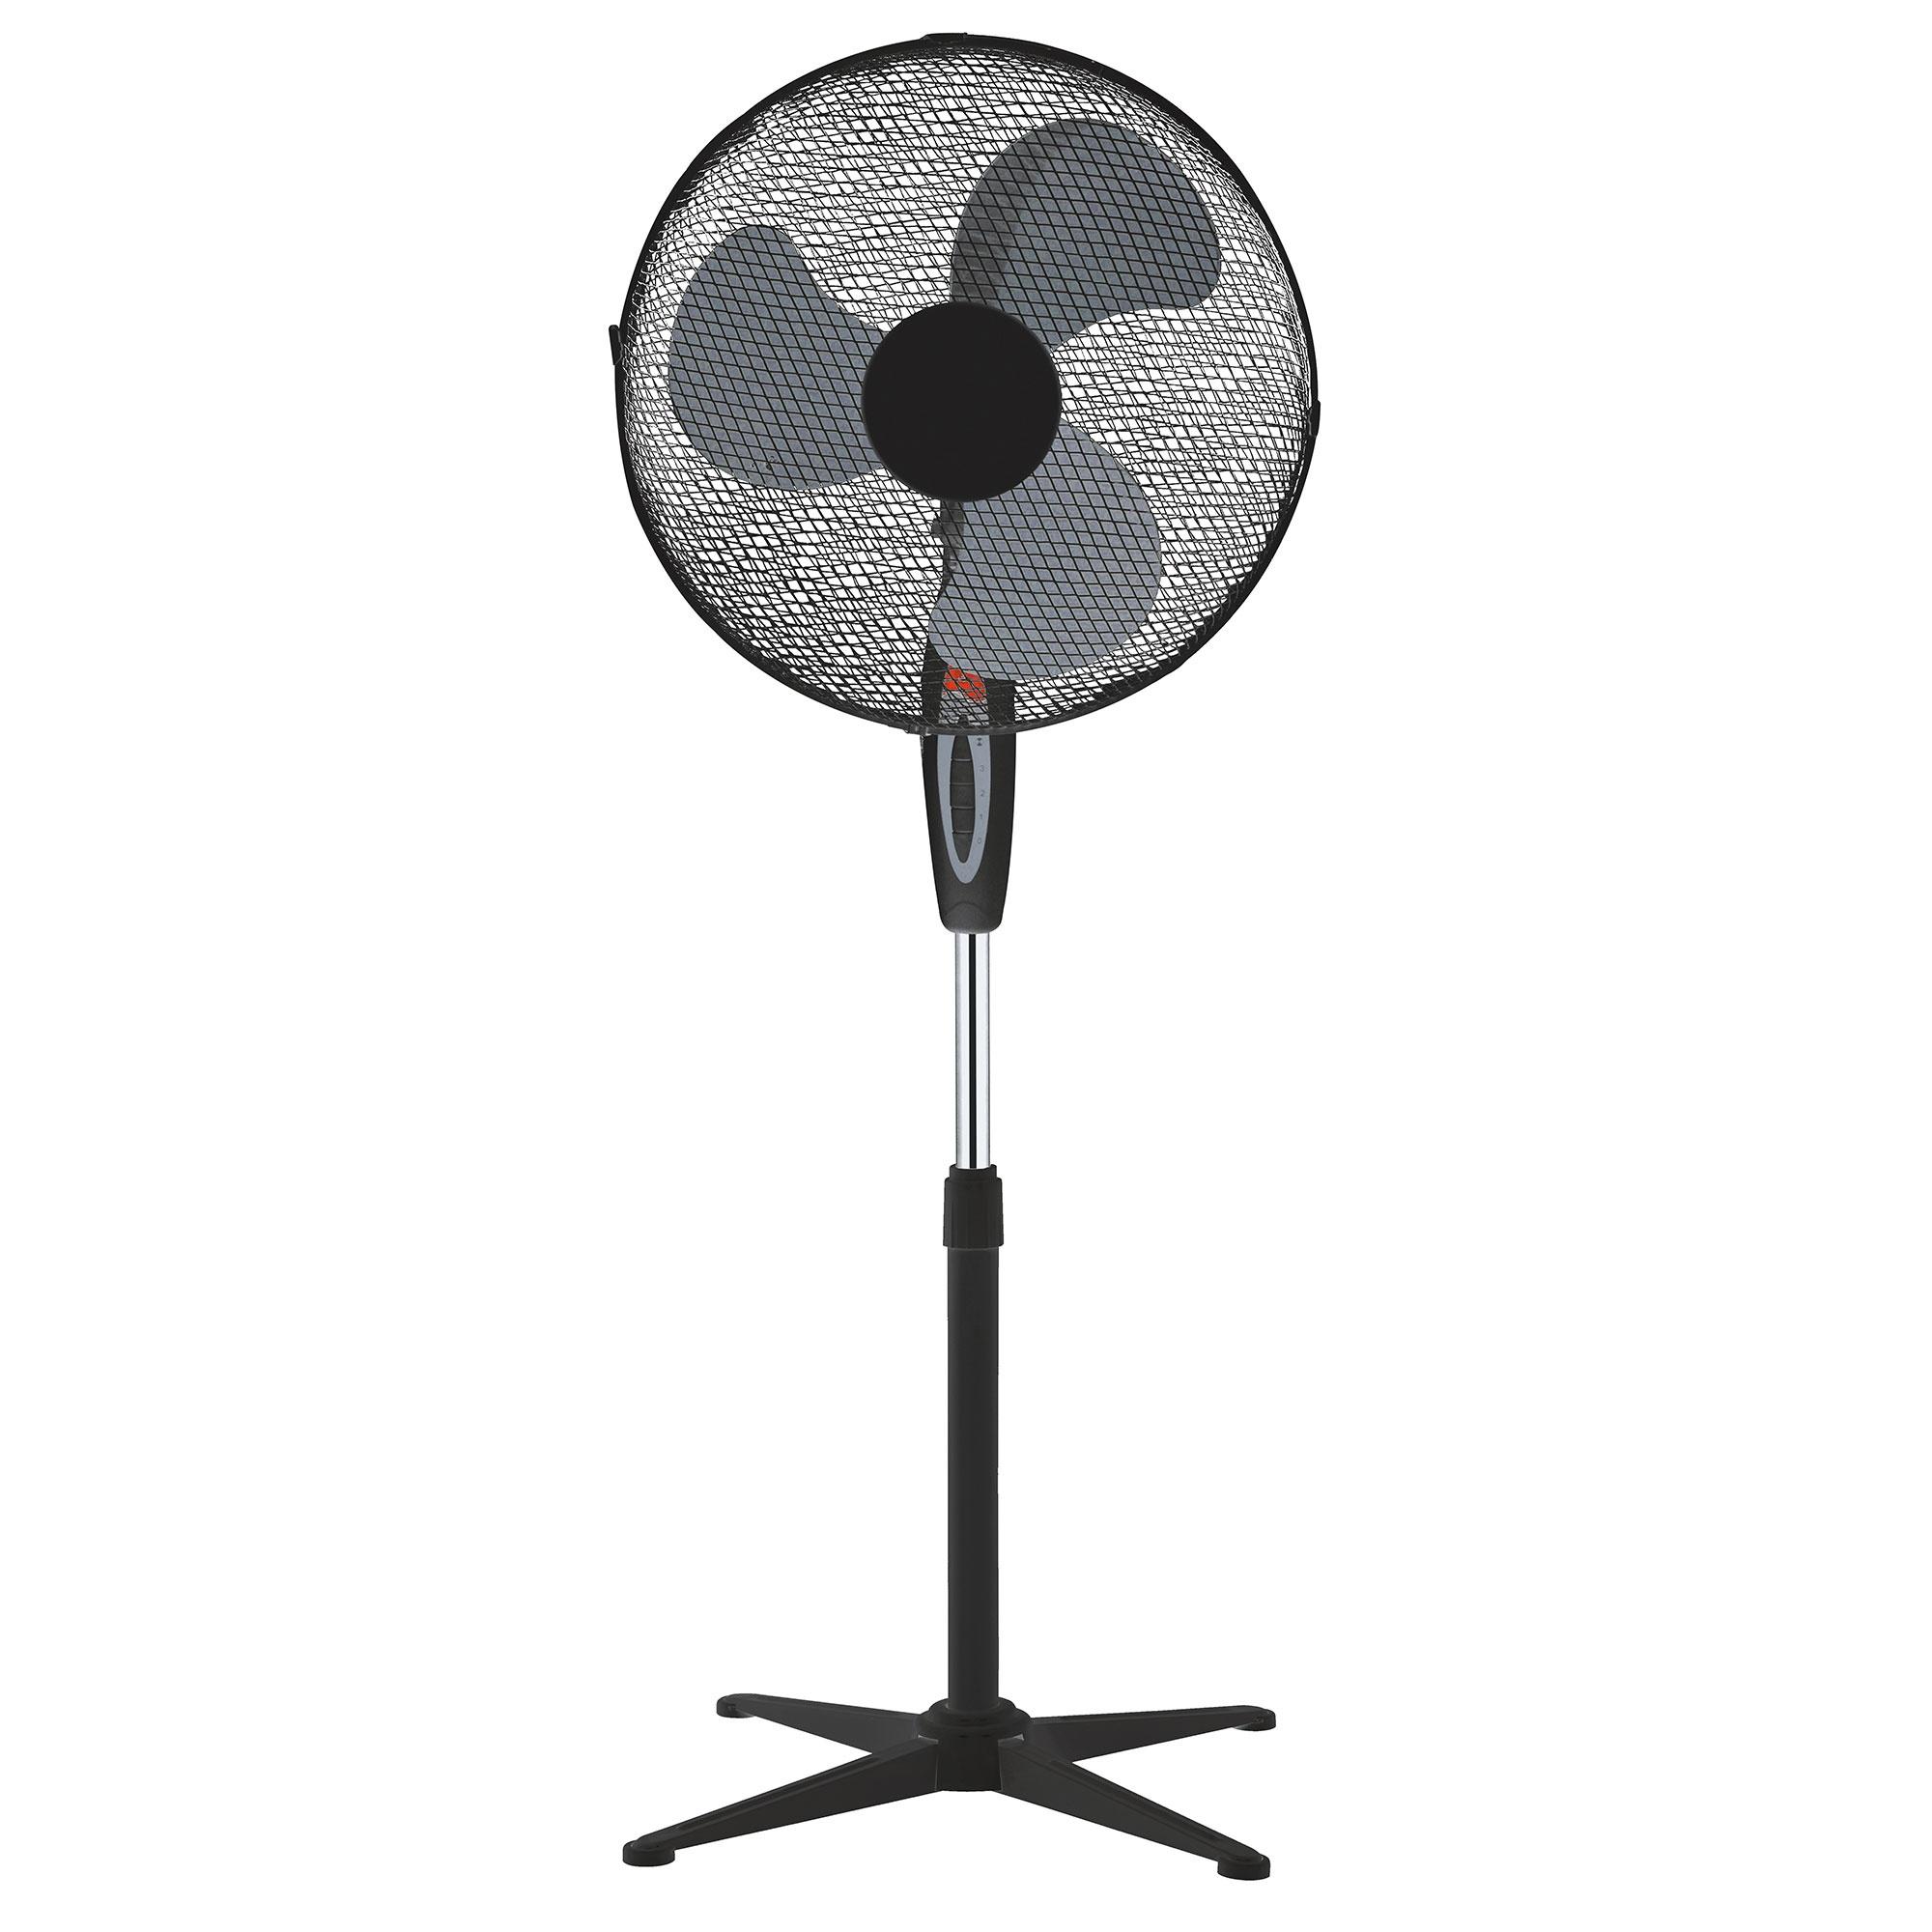 LEX Domácí ventilátor STANDVENTILATOR Black